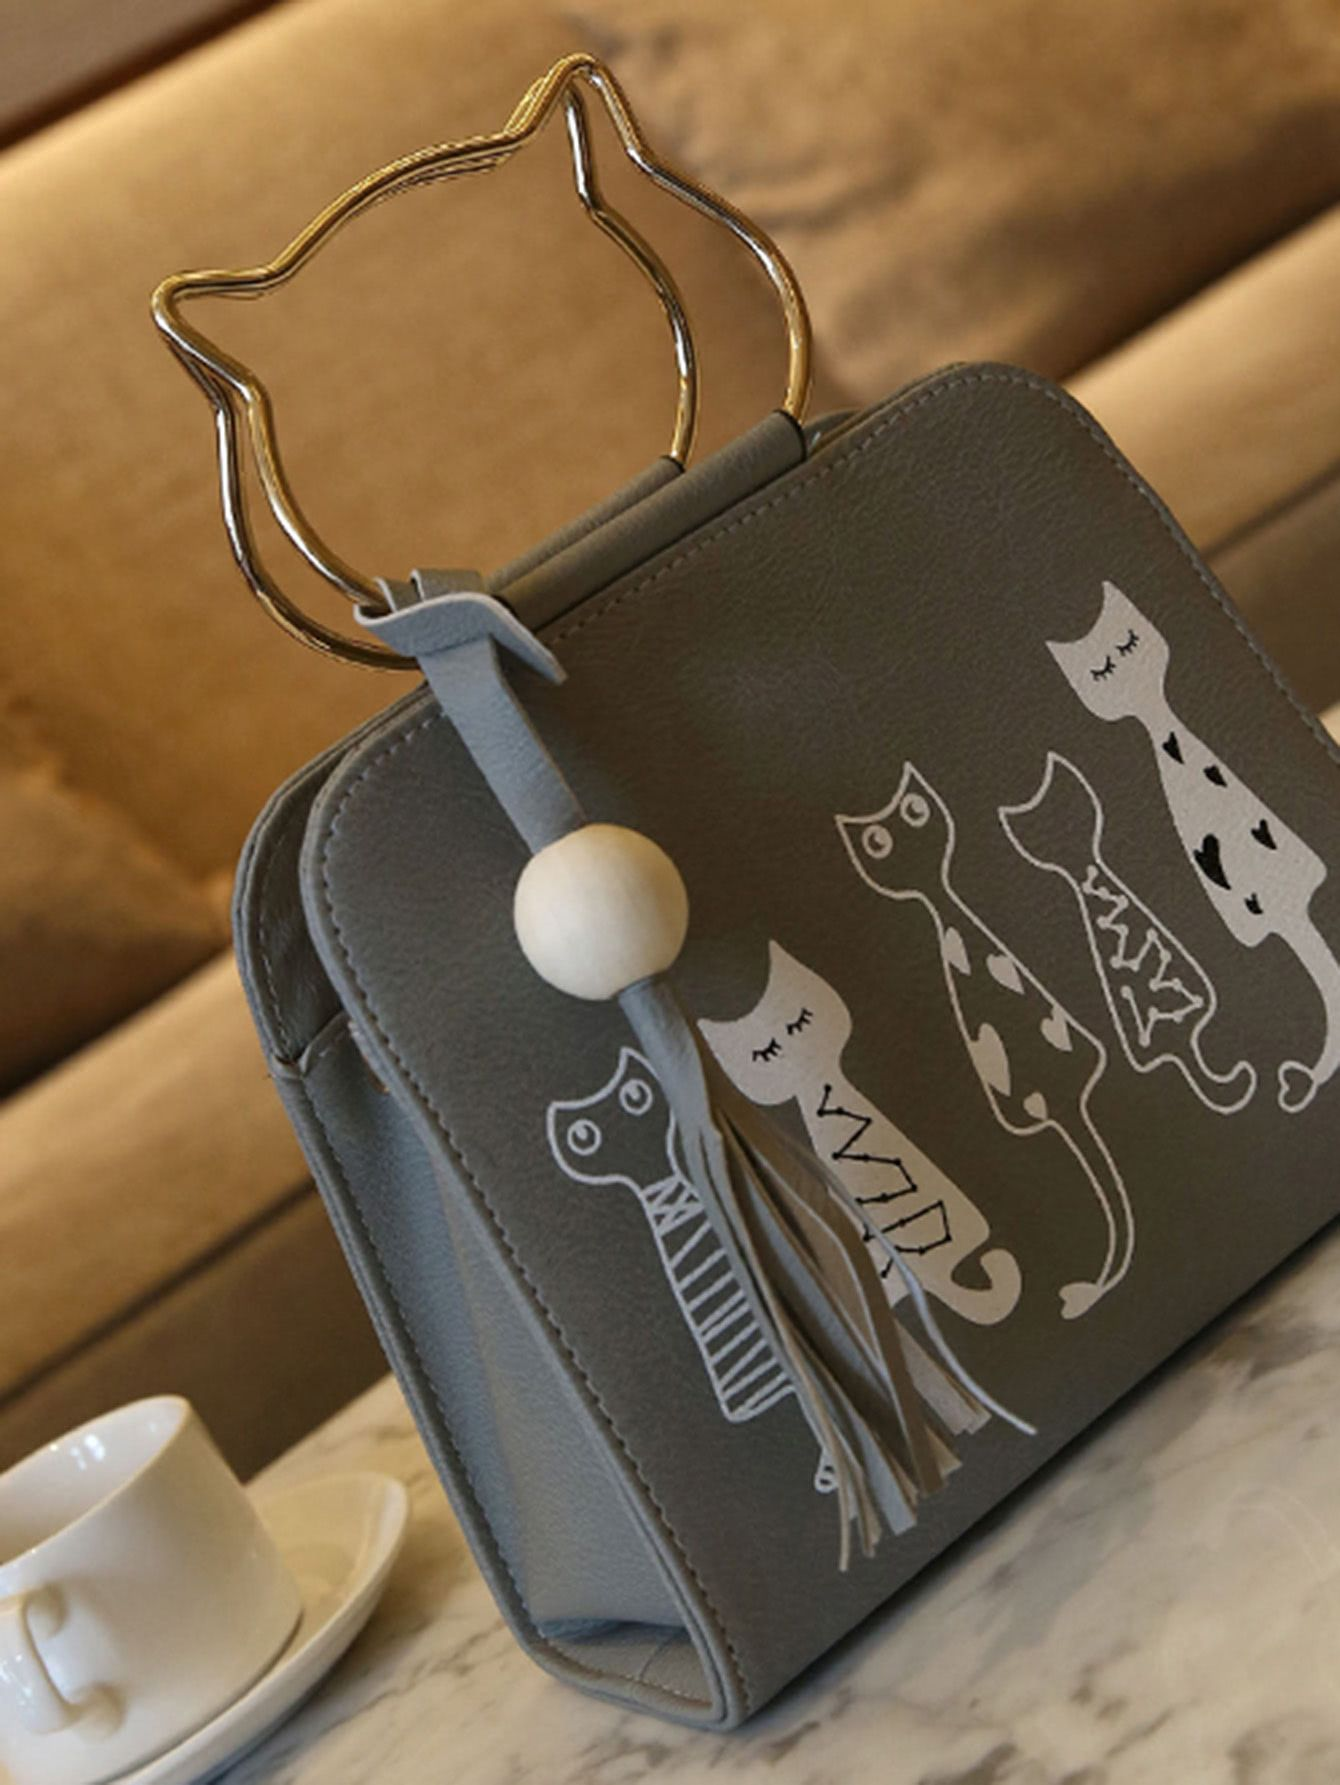 2619d42b22 Cartoon Print PU Shoulder Bag With Cat Ear Handle -SheIn(Sheinside ...